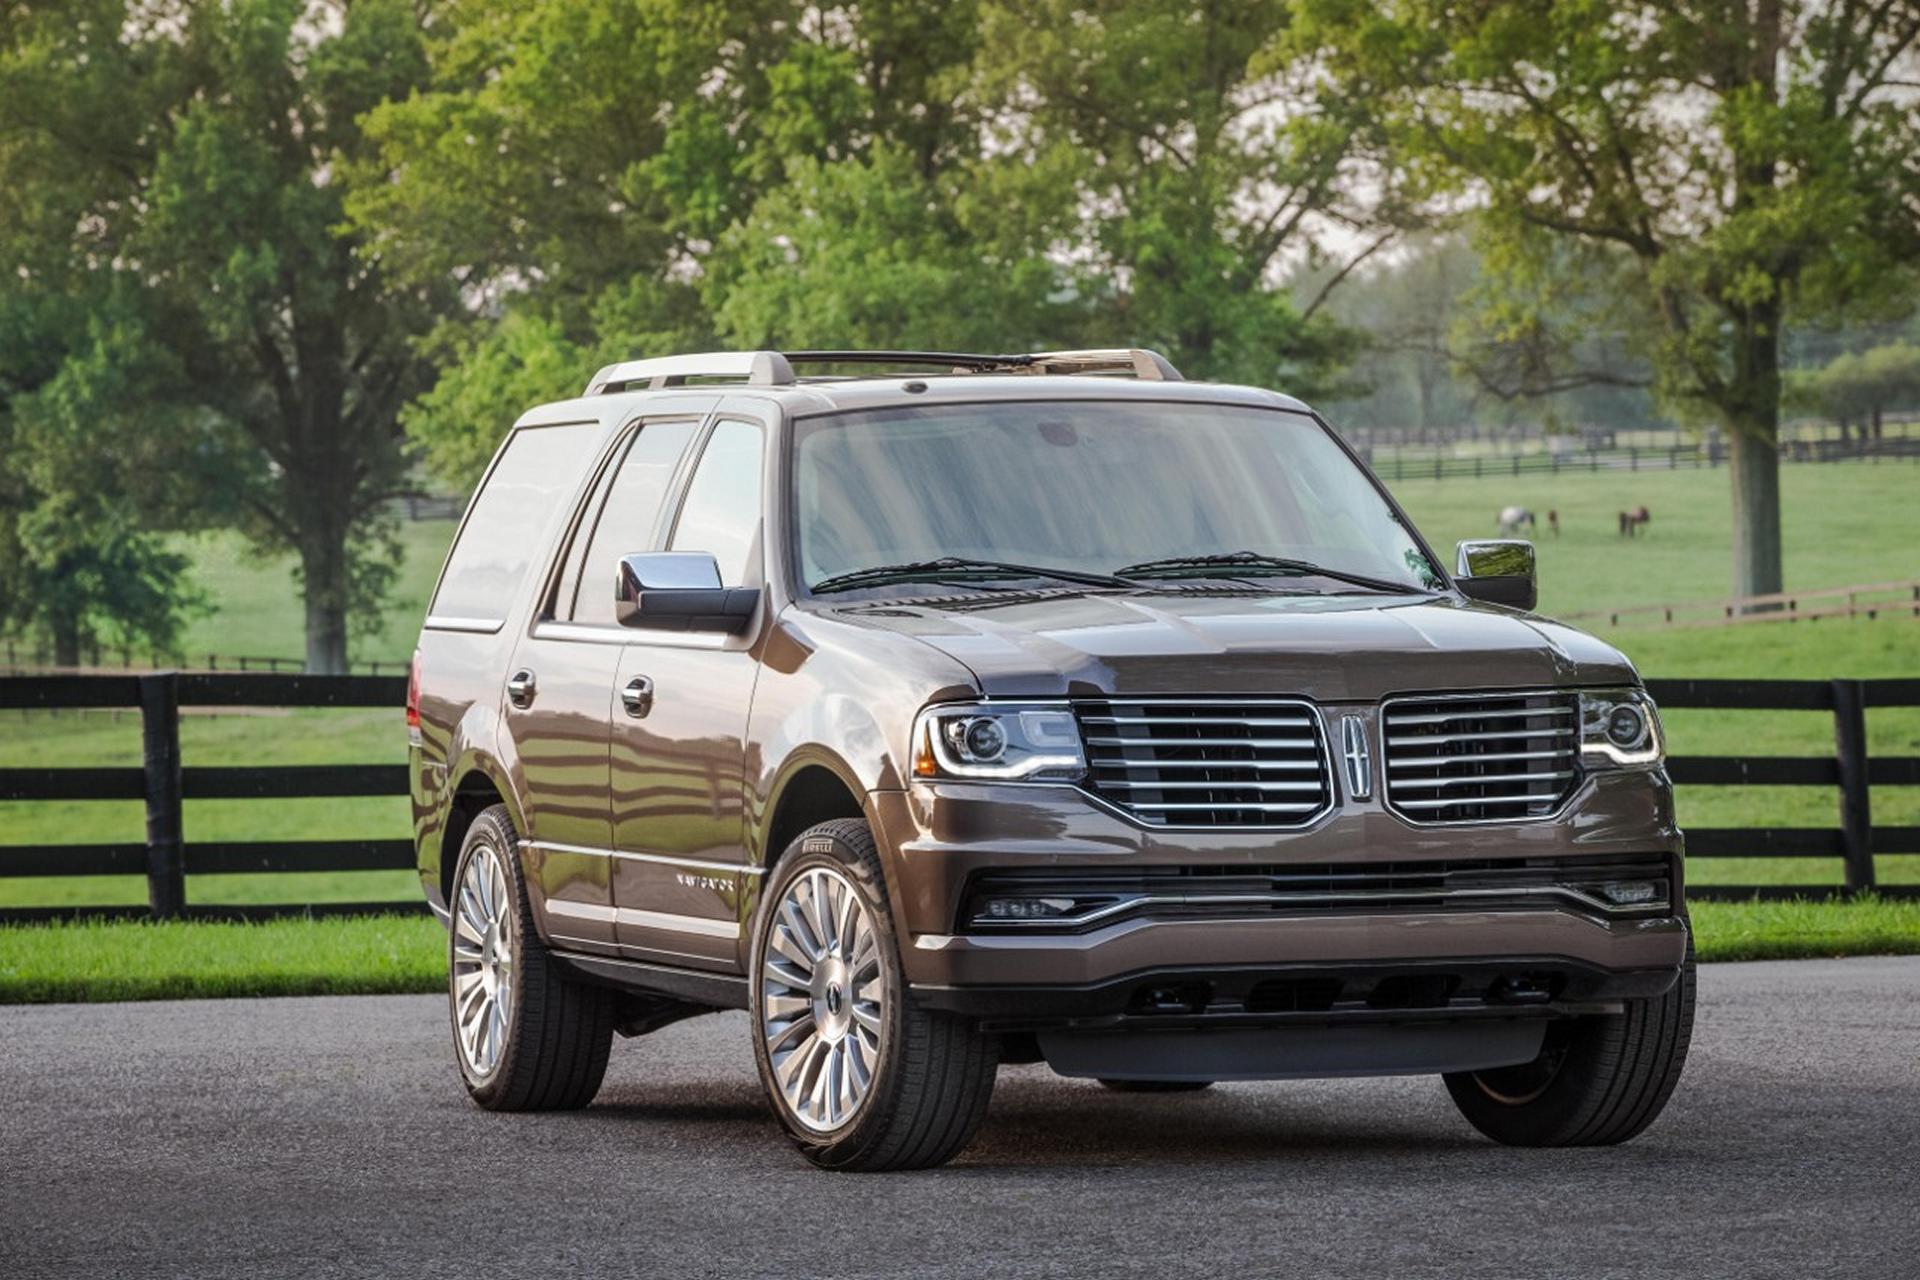 2016 Lincoln Navigator © Ford Motor Company